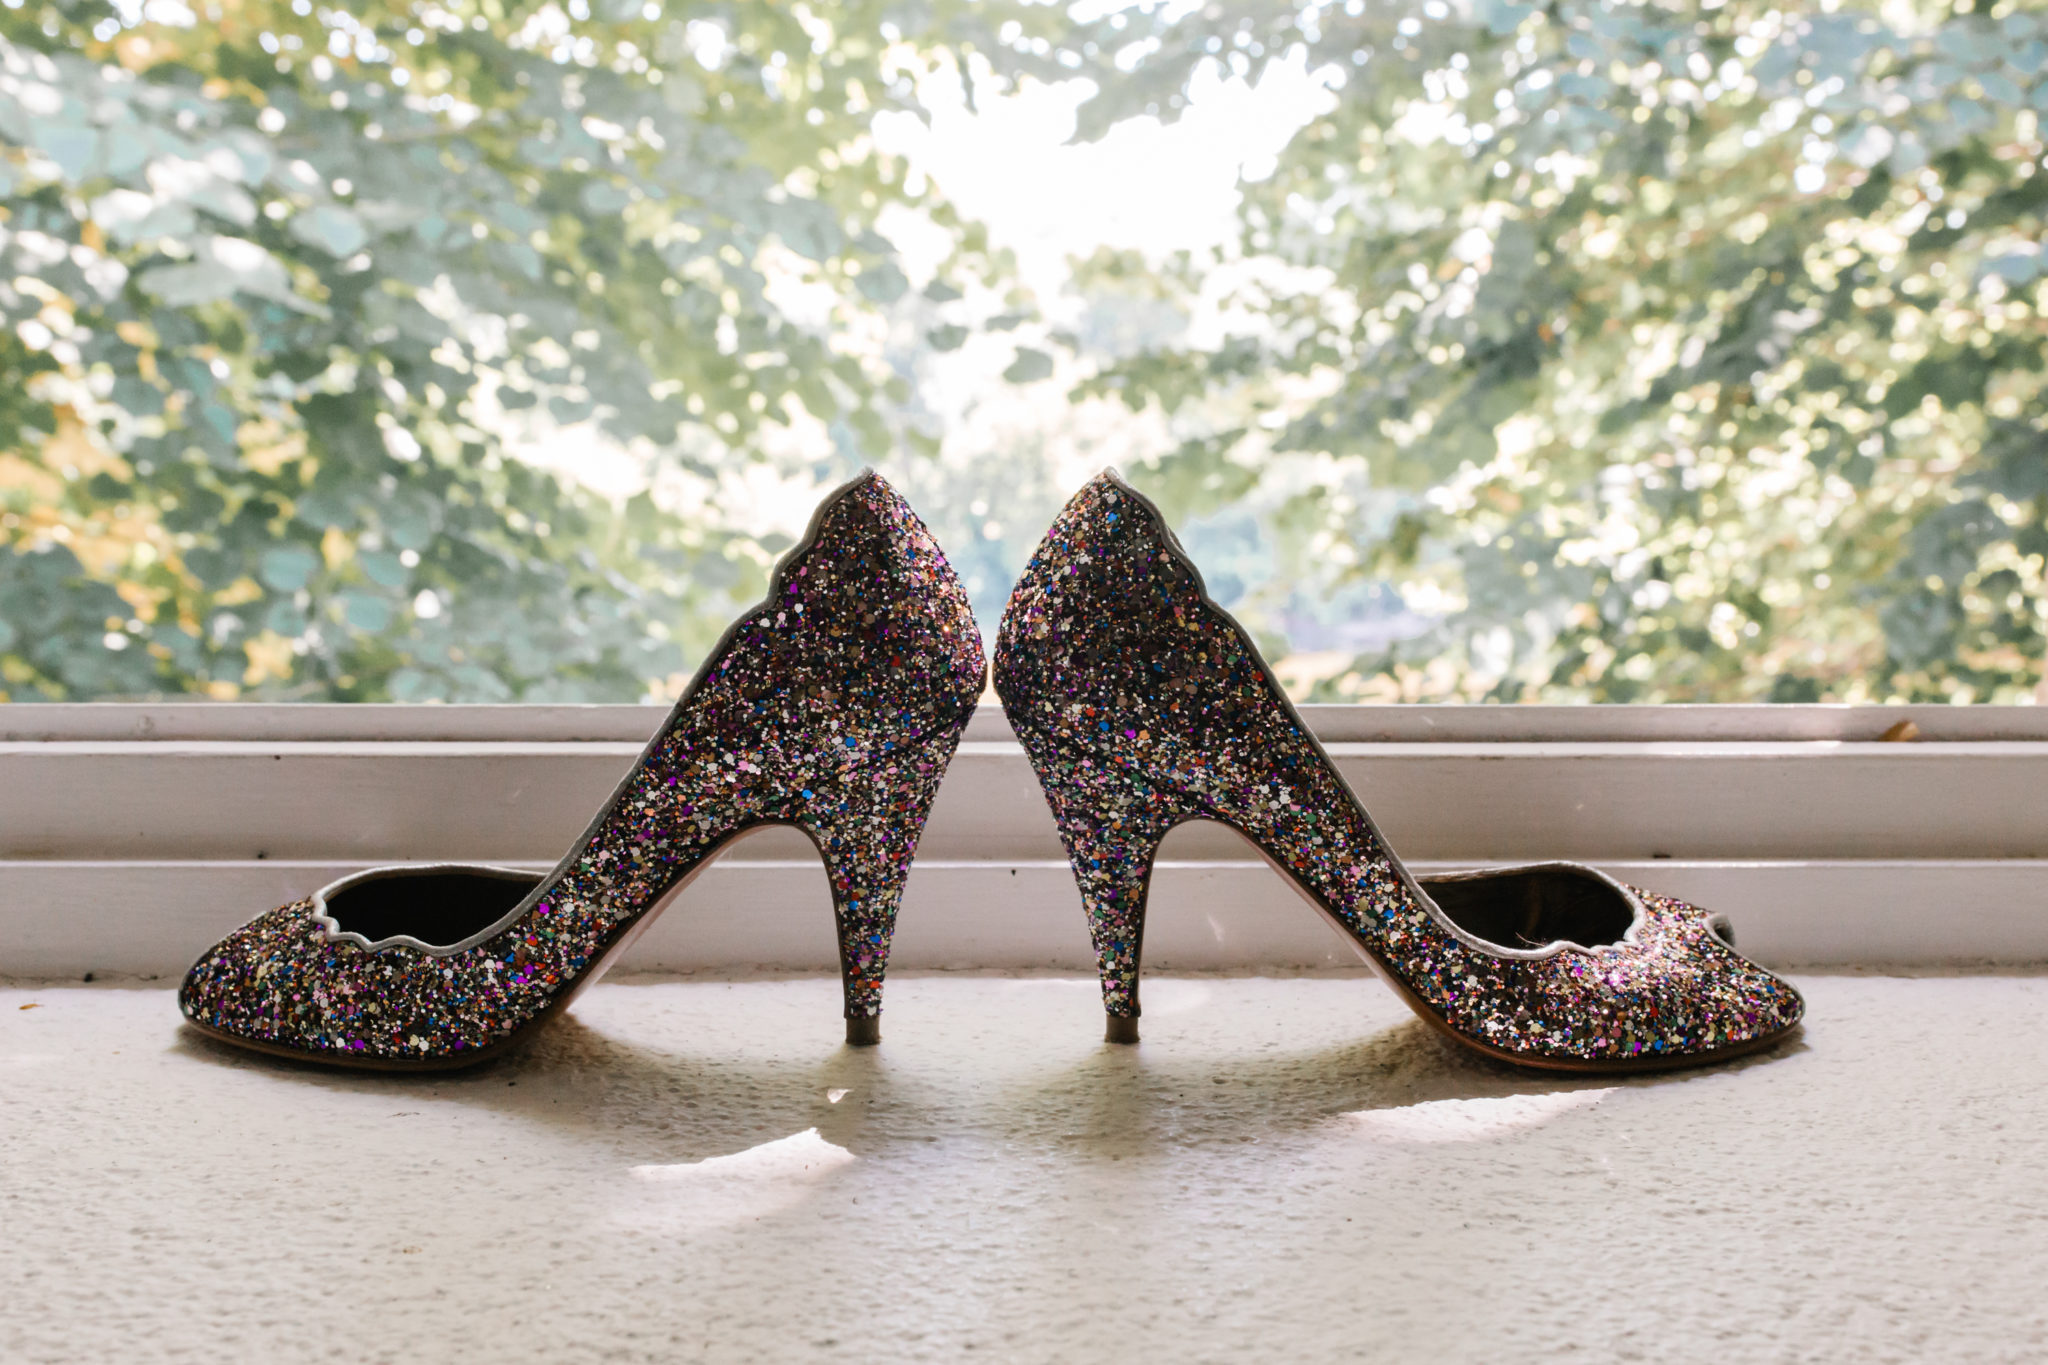 Patricia Blanchet Chaussures souliers paillettes glitter Chateau Pirey Dordogne